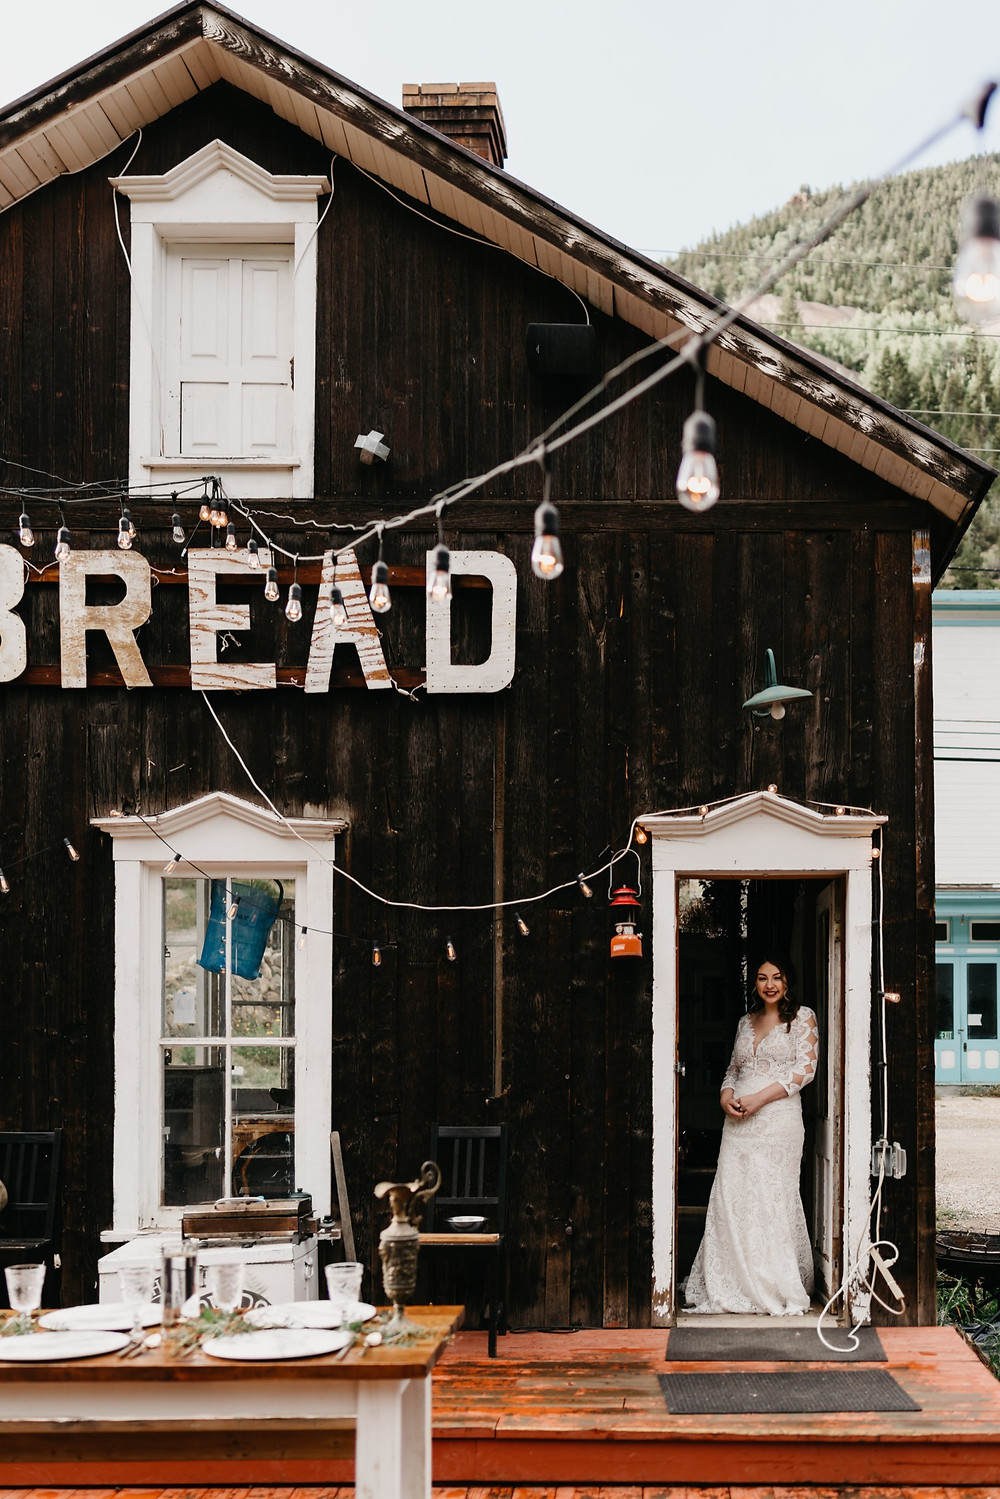 Bride Getting ready at Bread bar silver Plume Colorado